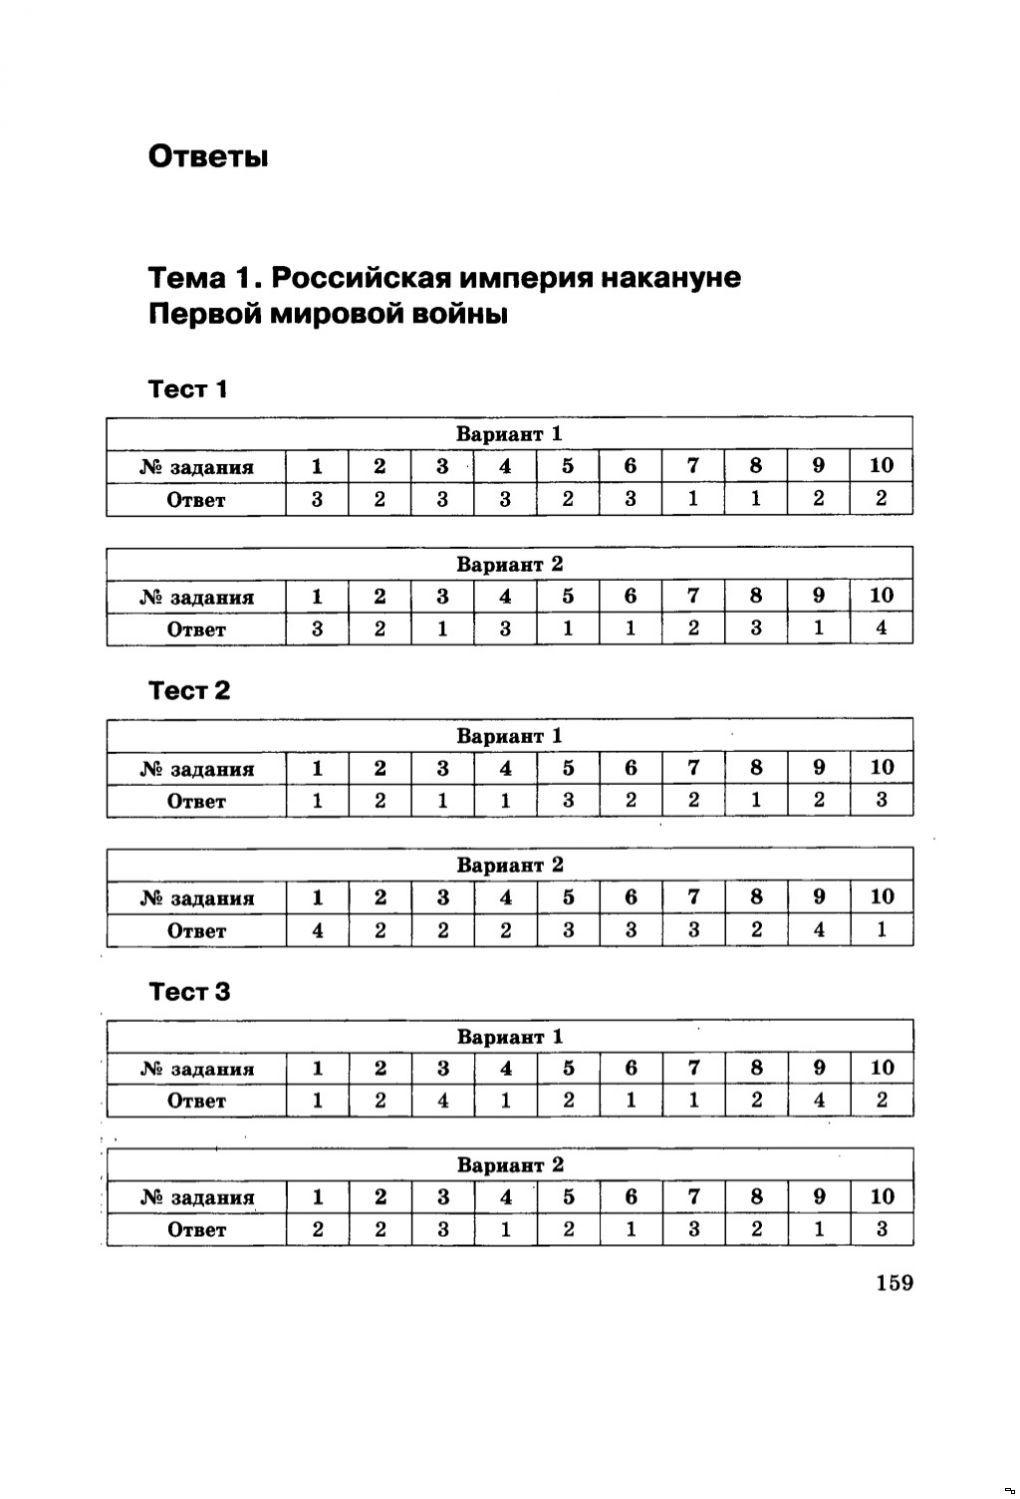 Английский язык перевод текста с английского на русский амелия беделия глава 4 6 класс бибалетова